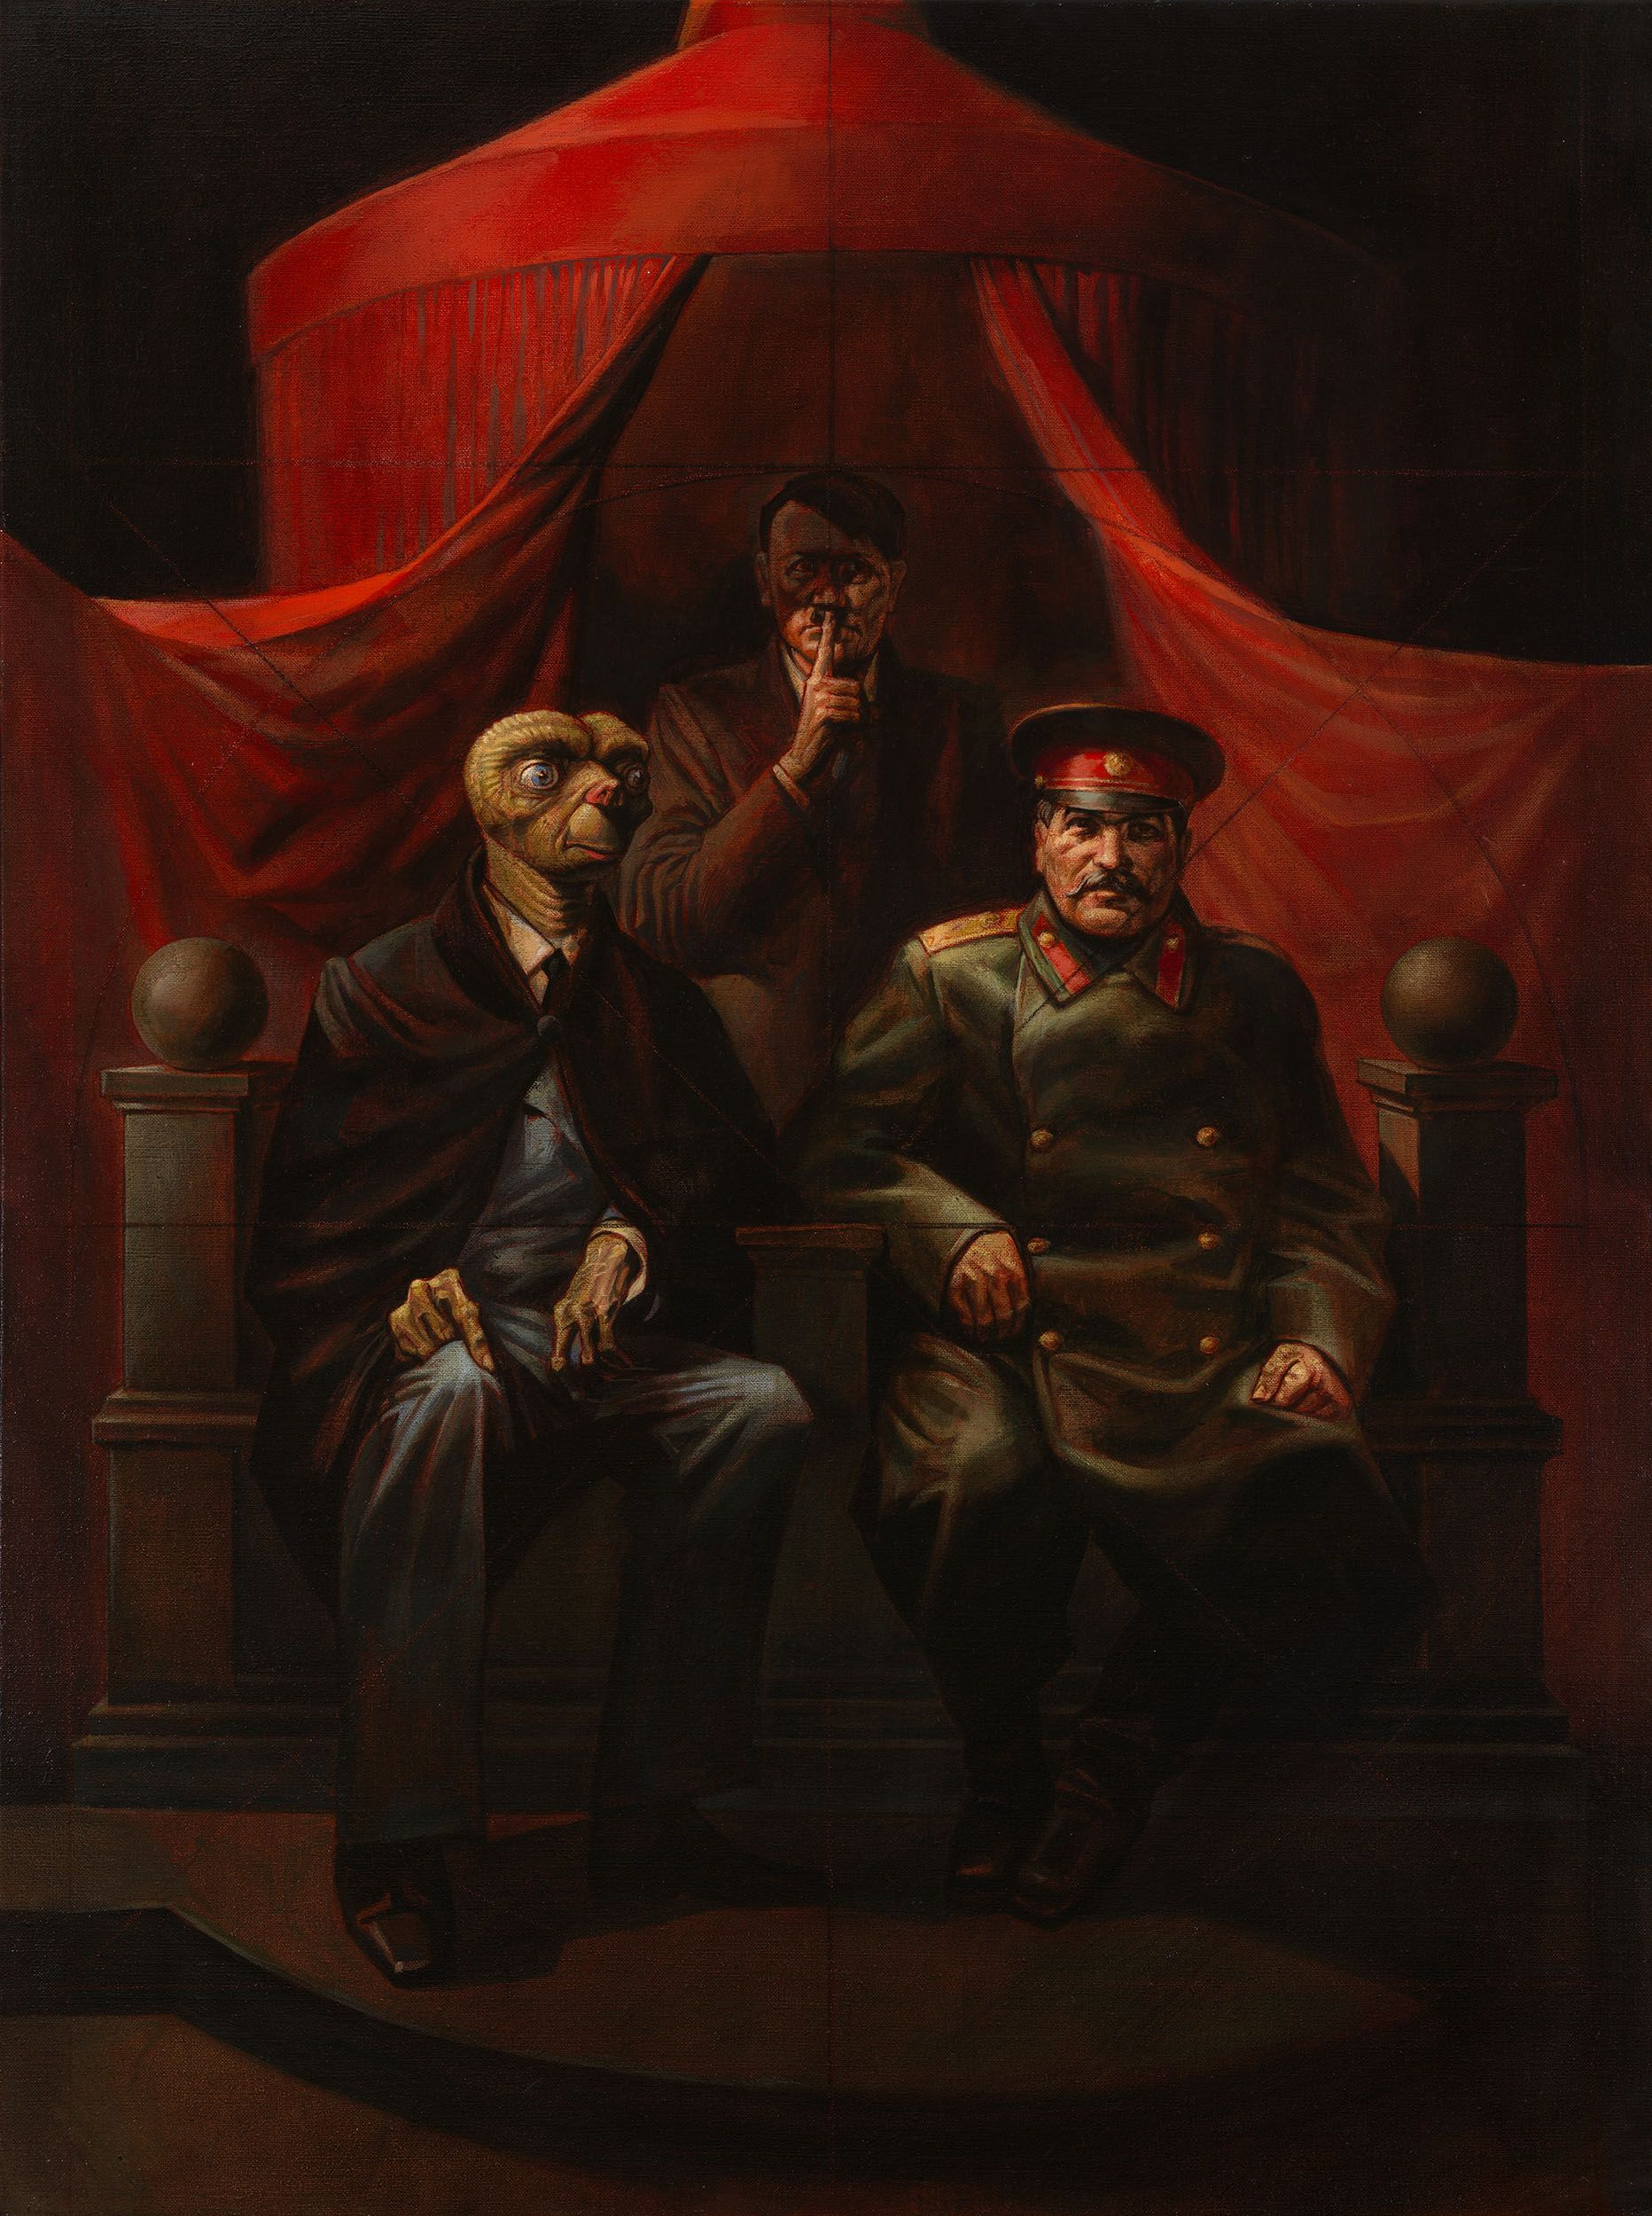 Lot 173, Vitaly Komar, Alexander Melamid, Yalta Conference